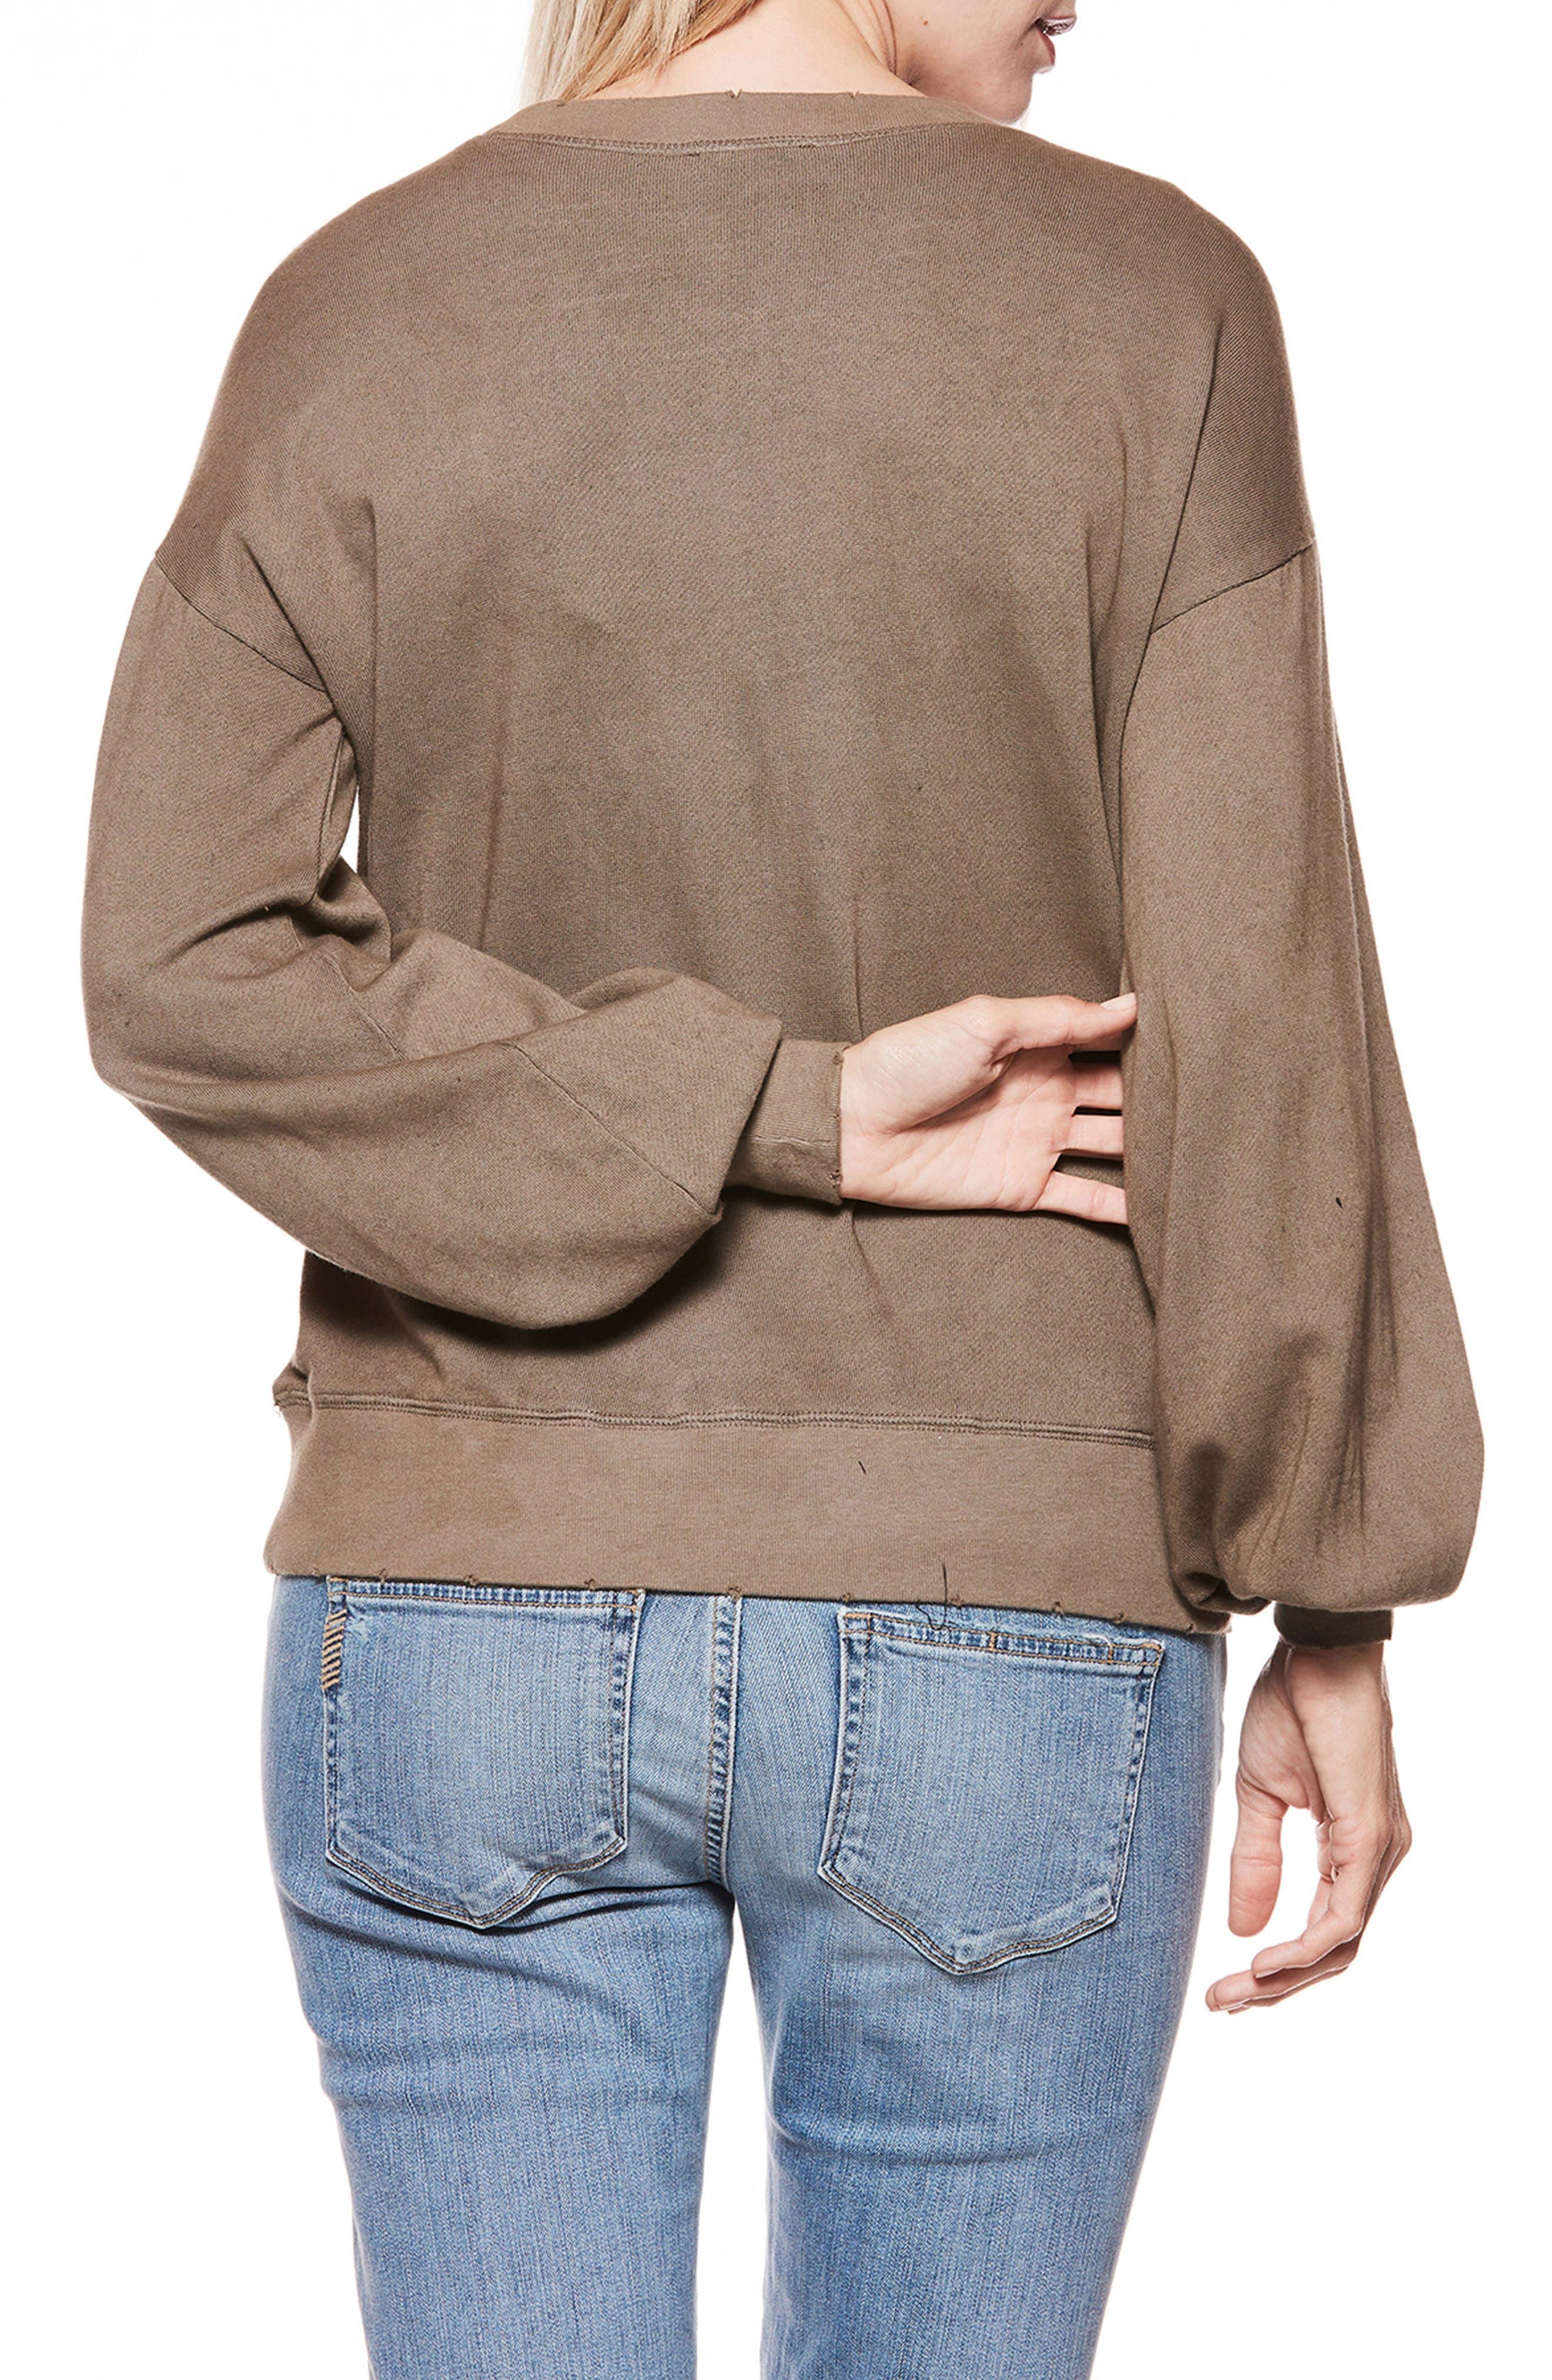 Cortlynn Sweatshirt,                             Alternate thumbnail 2, color,                             Tanned Olive